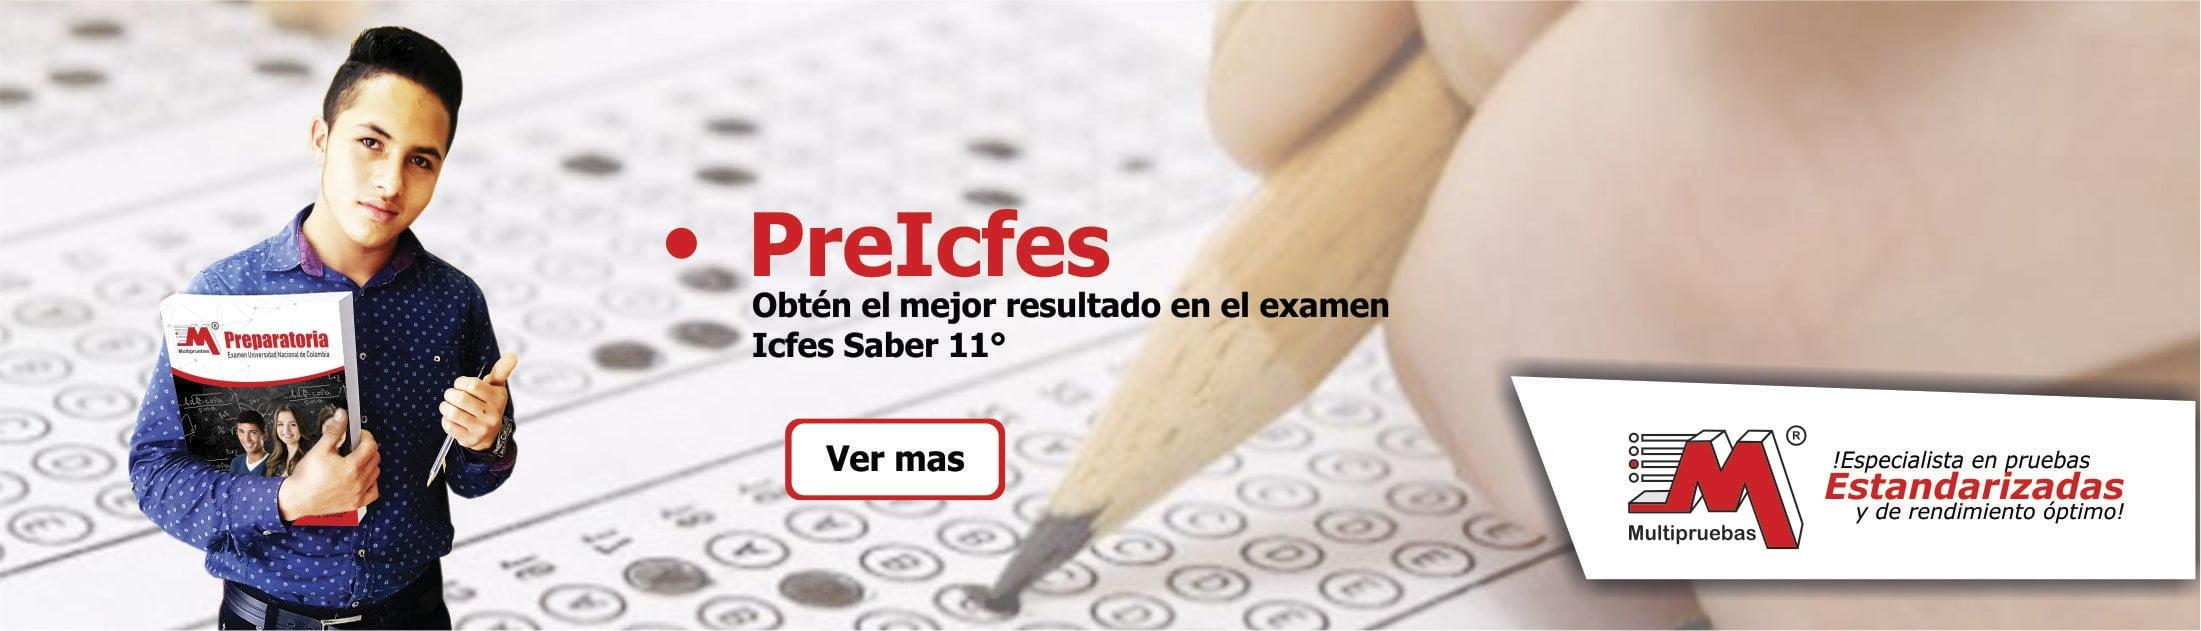 preicfes